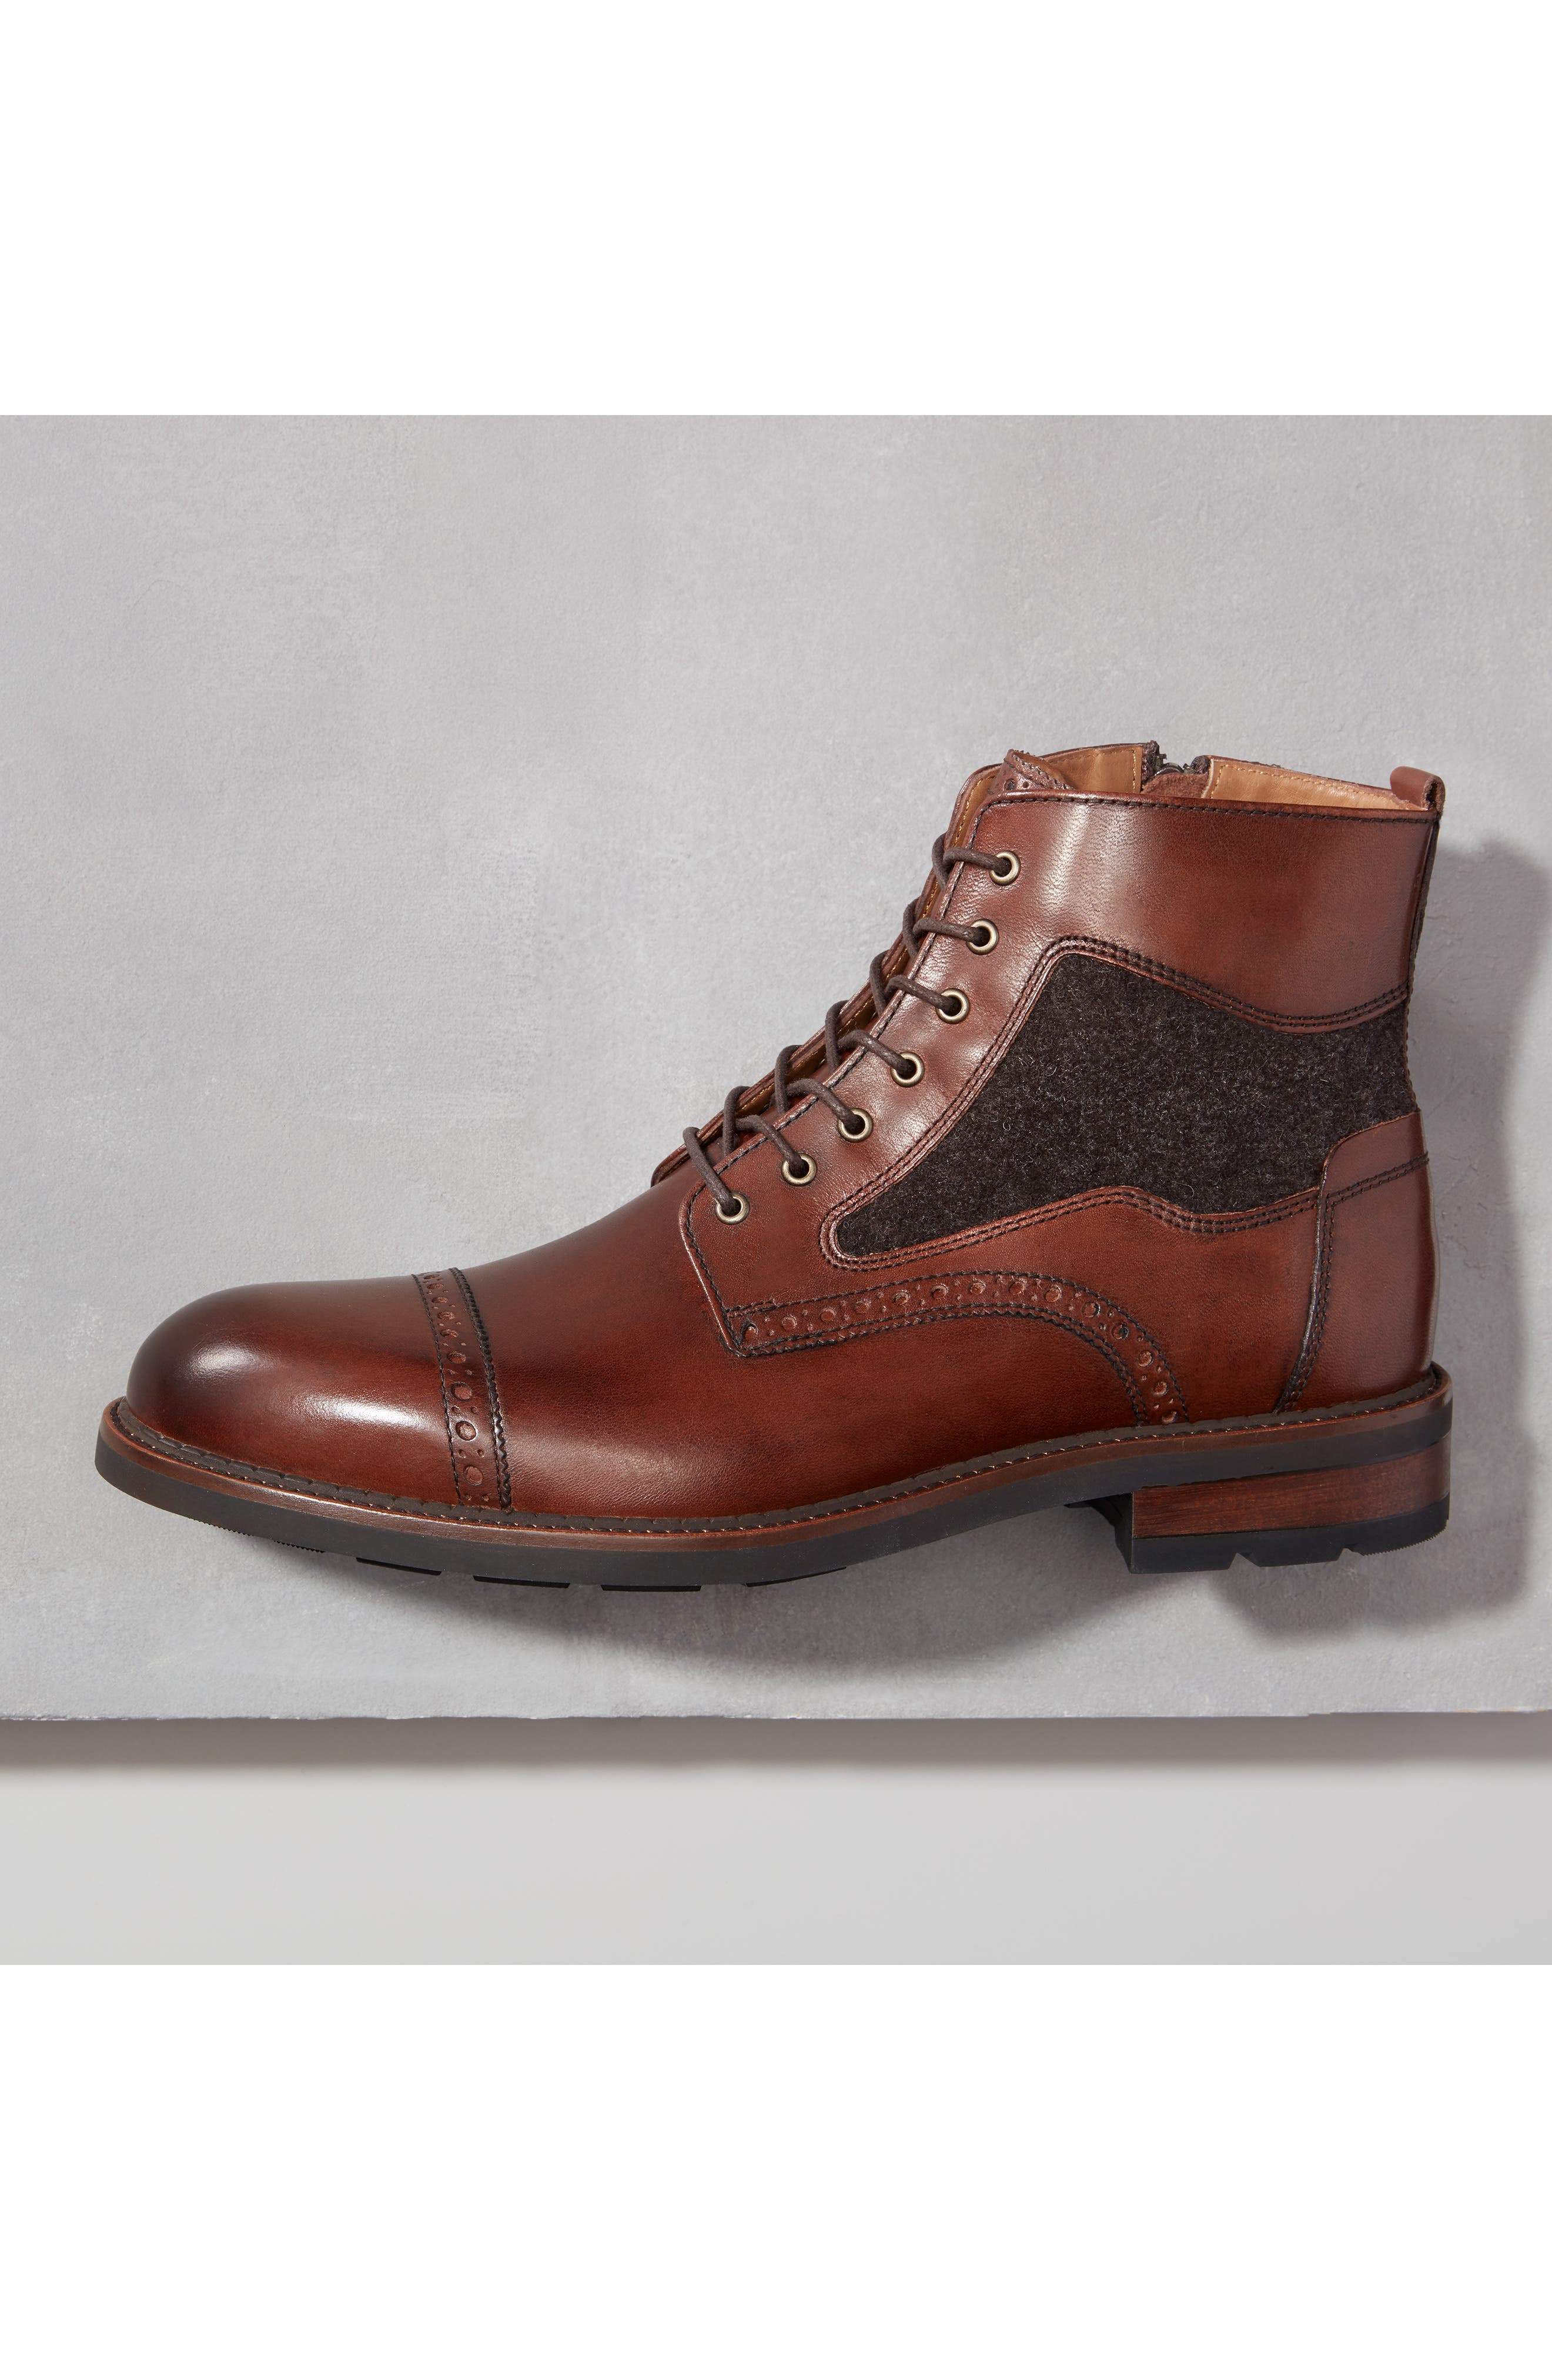 Fullerton Zip Boot,                             Alternate thumbnail 8, color,                             MAHOGANY